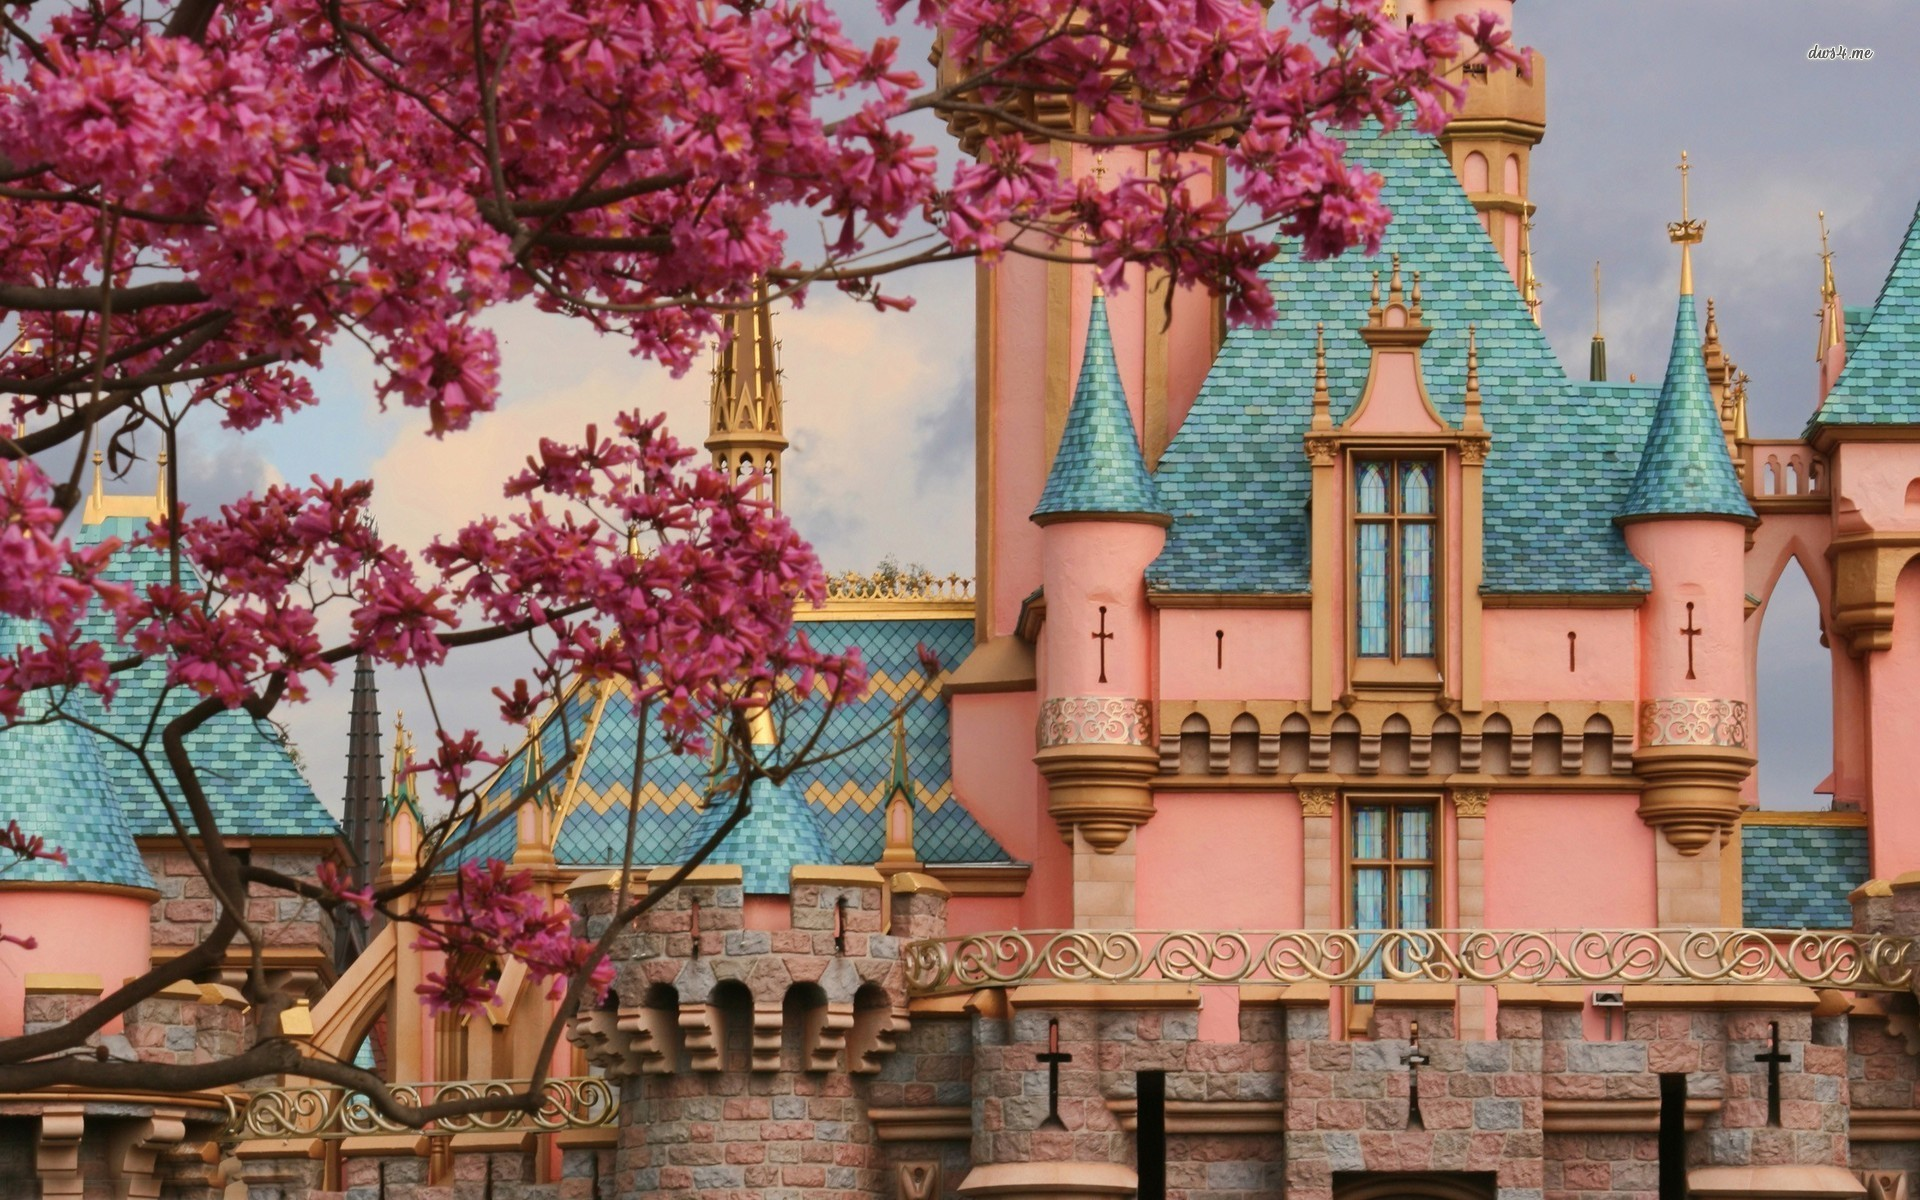 25 best ideas about <b>Disney wallpaper</b> on Pinterest  